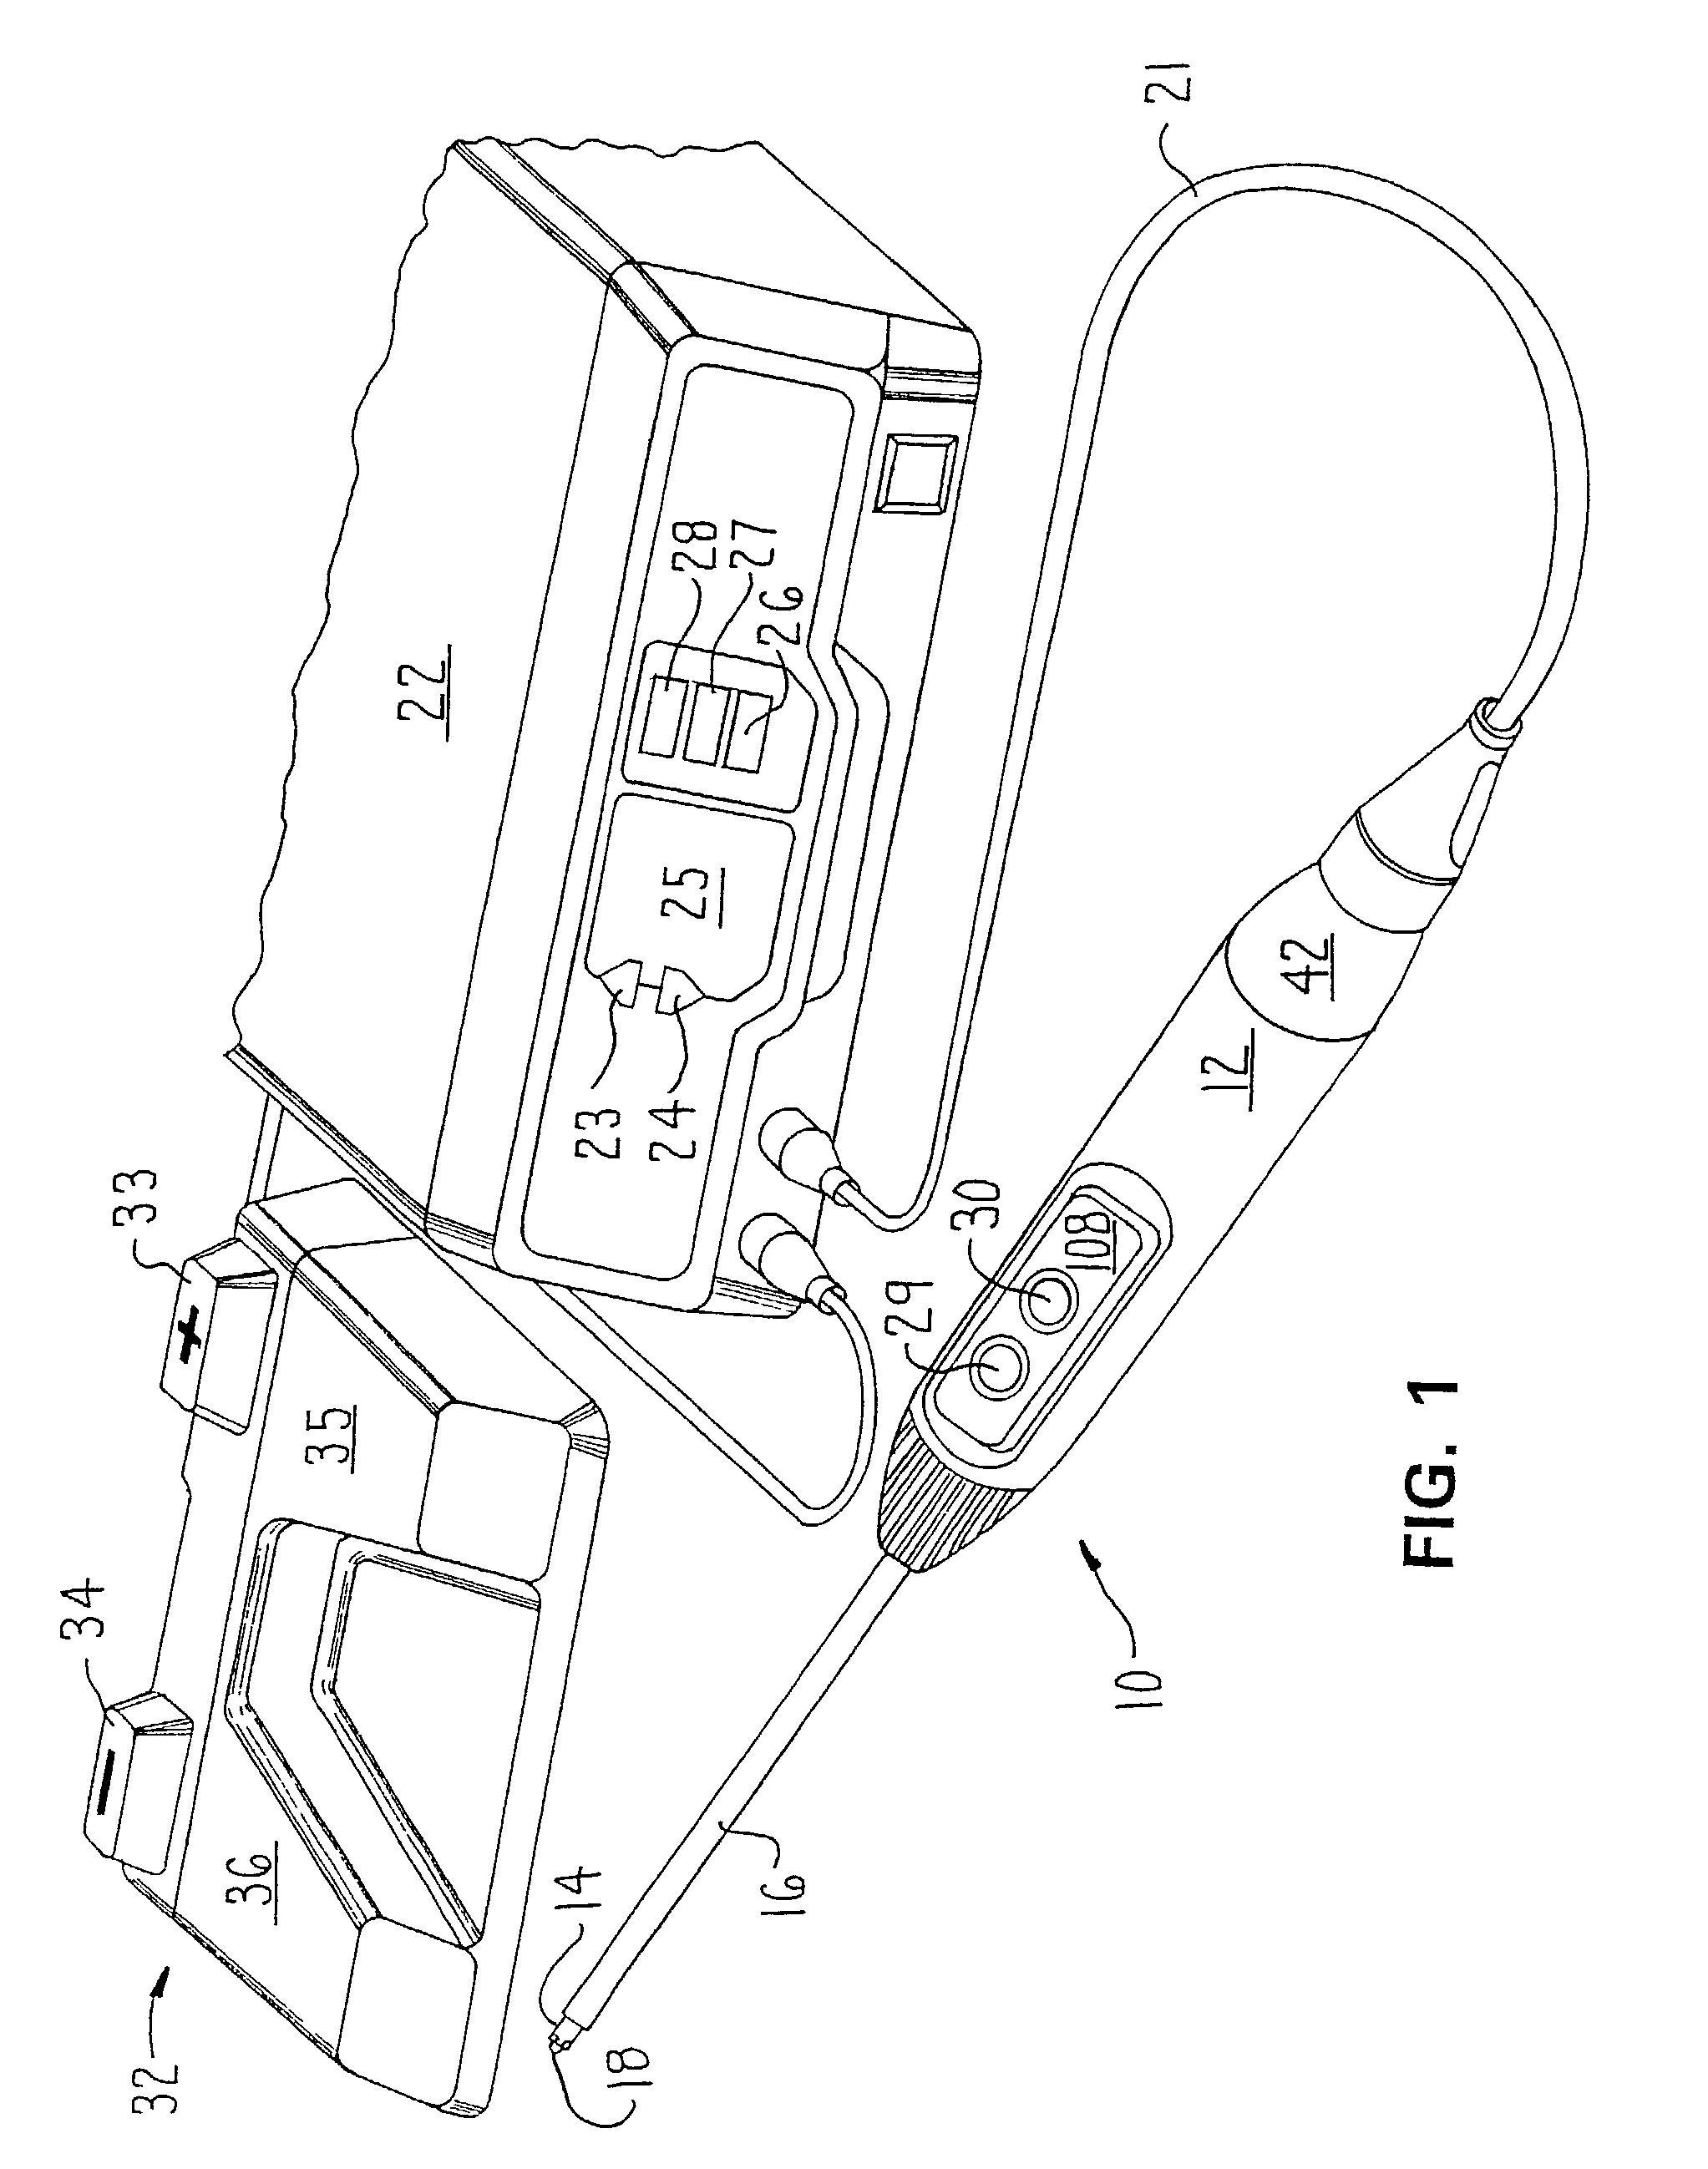 patente us20030004508